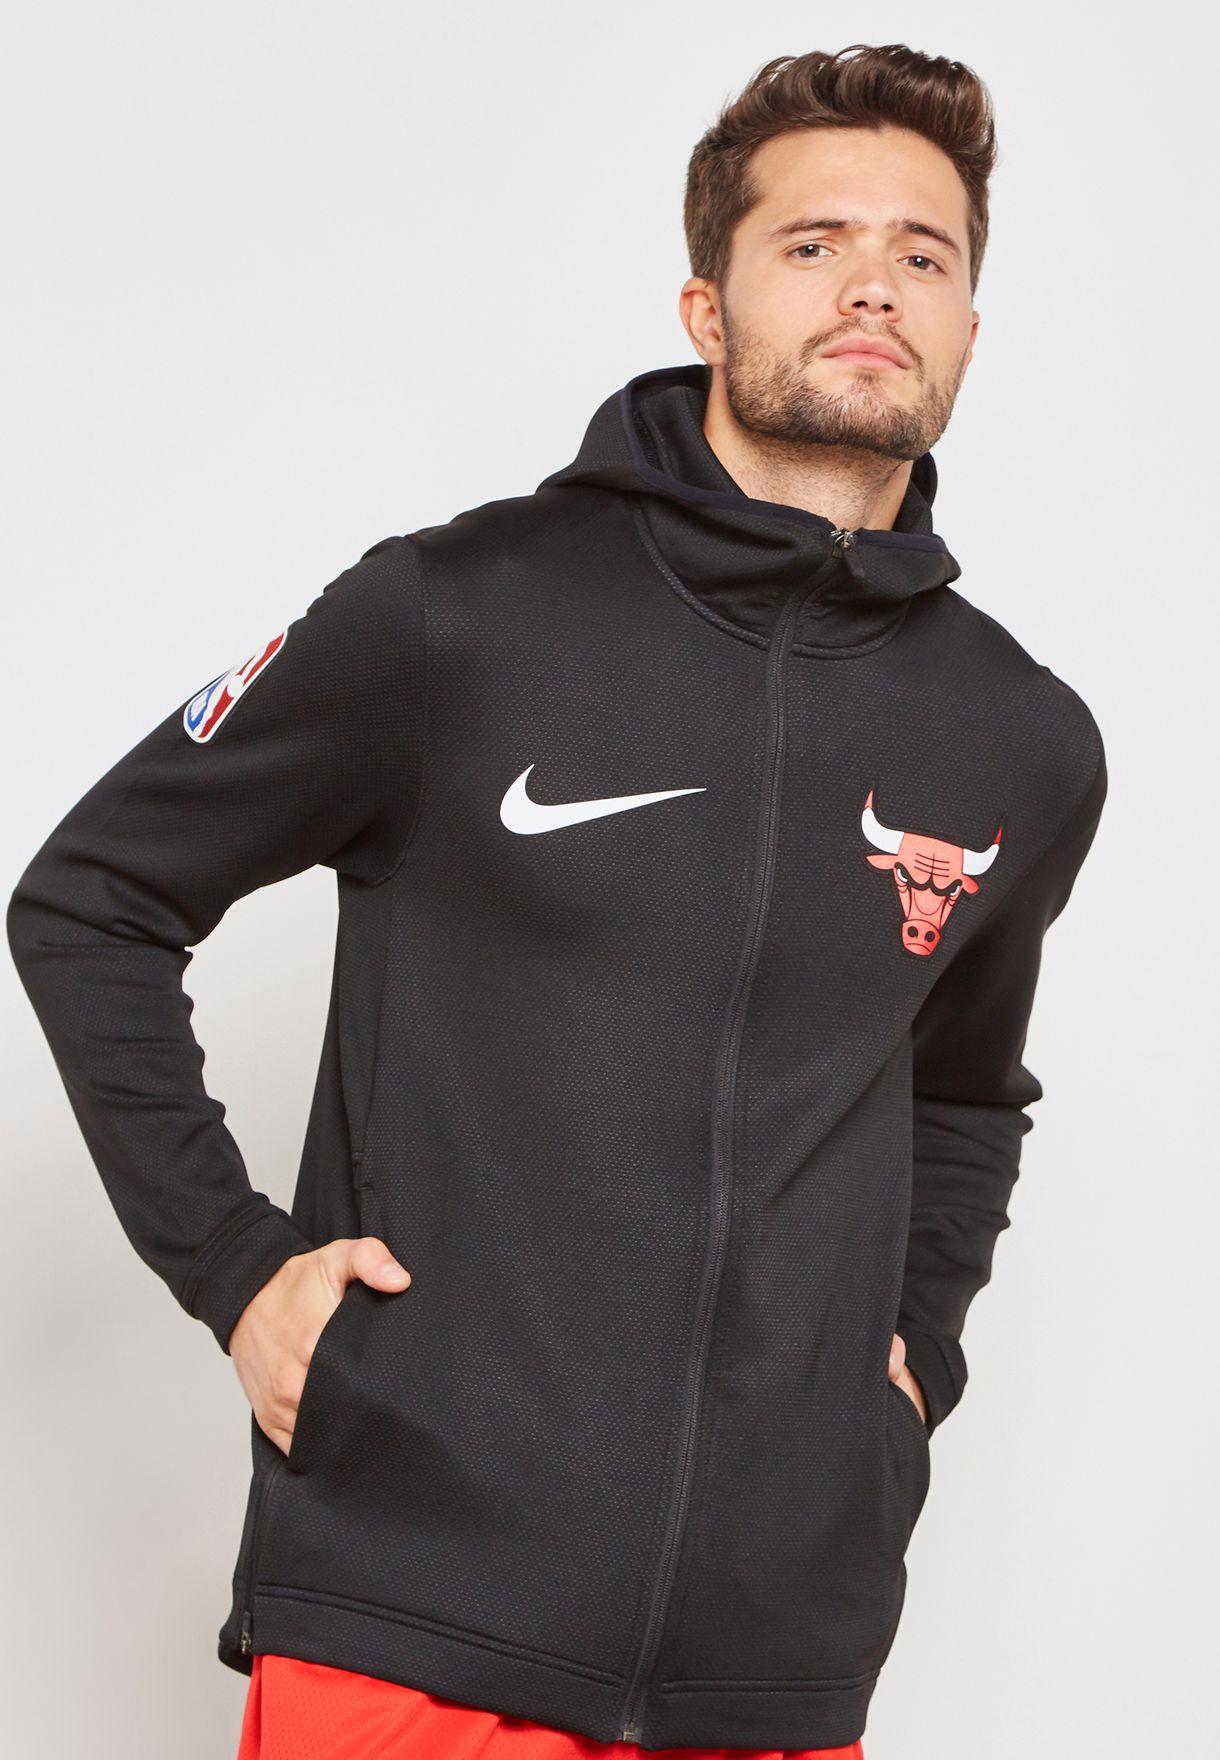 19a856b1274 Shop Nike black Chicago Bulls Therma Flex Showtime Hoodie 940118-010 ...